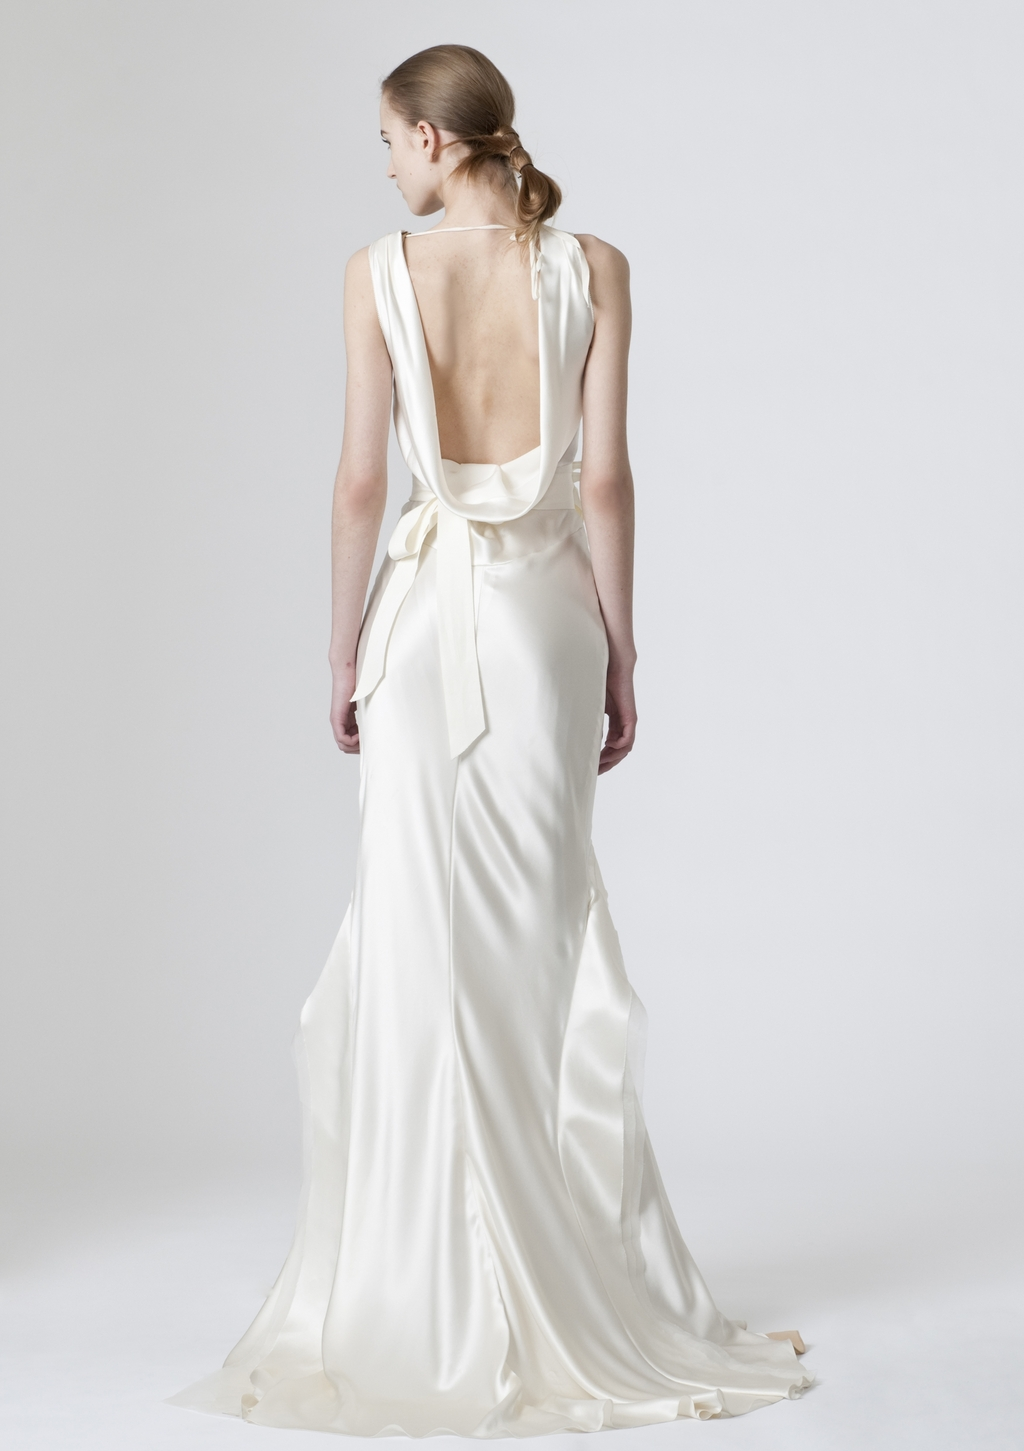 Vera-wang-wedding-dresses-spring-2010-3-back.full